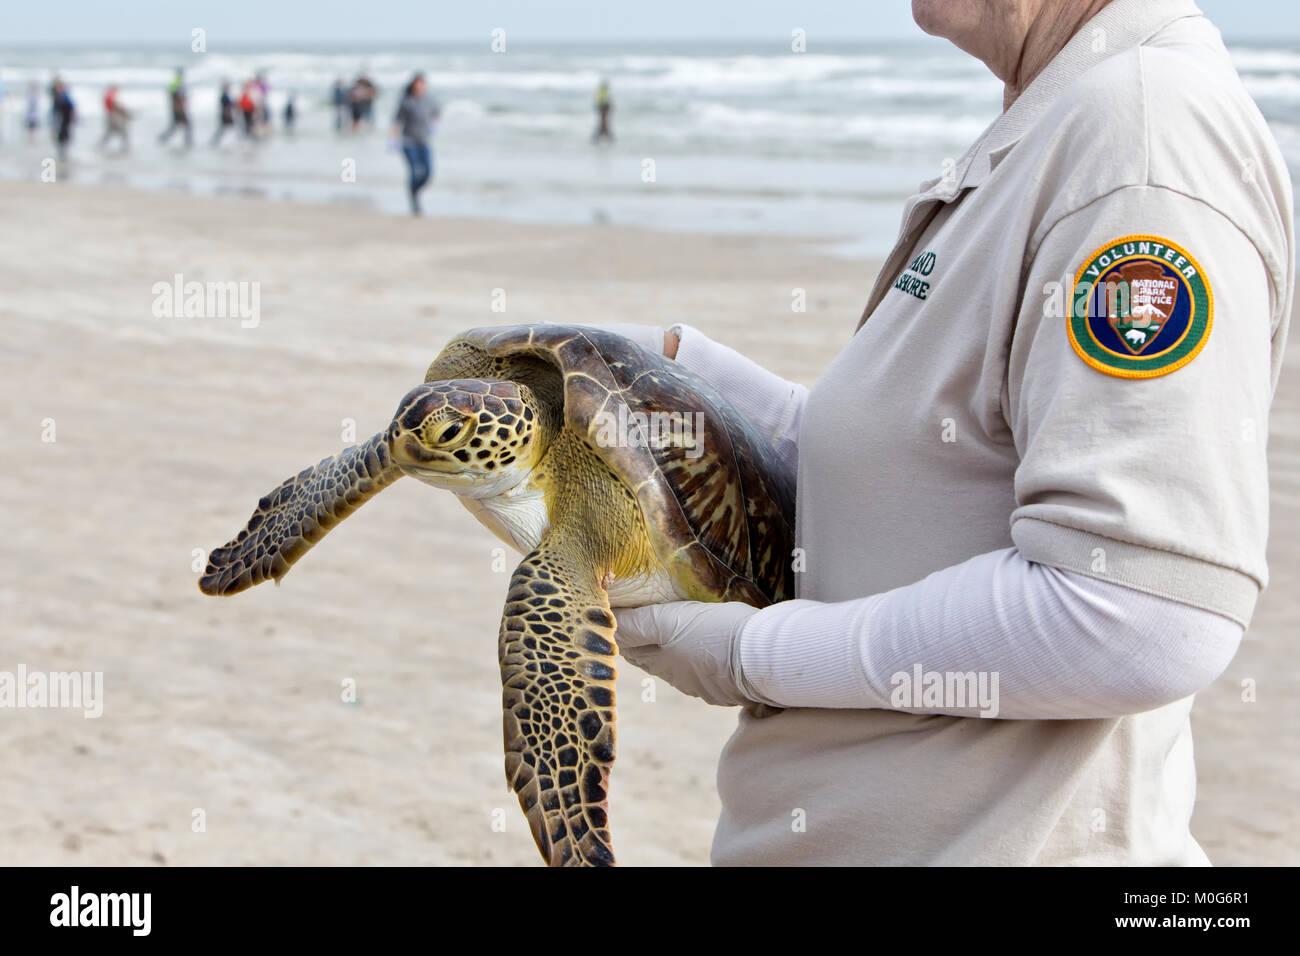 Adult female volunteer carrying & showing rehabilitated Kemp's Ridley Sea Turtle 'Lepidochelys kempii' - Stock Image